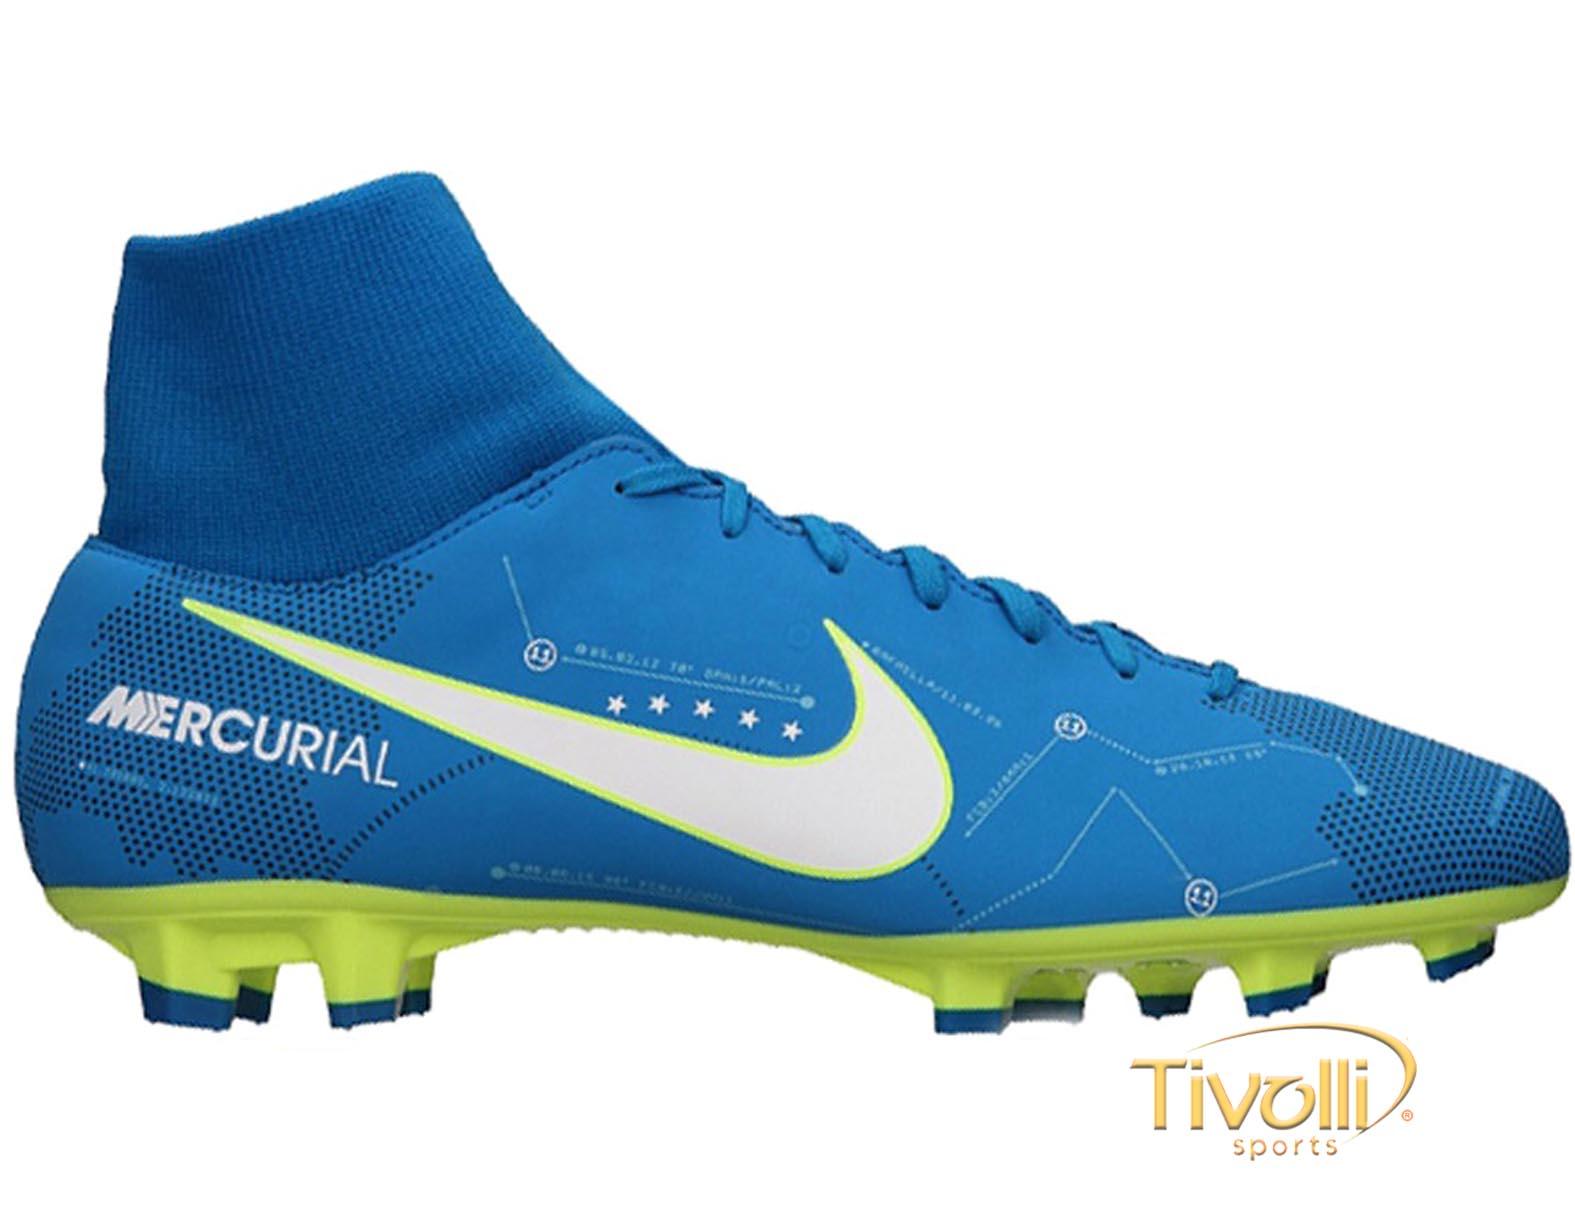 0838ed5267 Chuteira Nike MercurialX Victory VI DF Neymar Jr. FG Campo